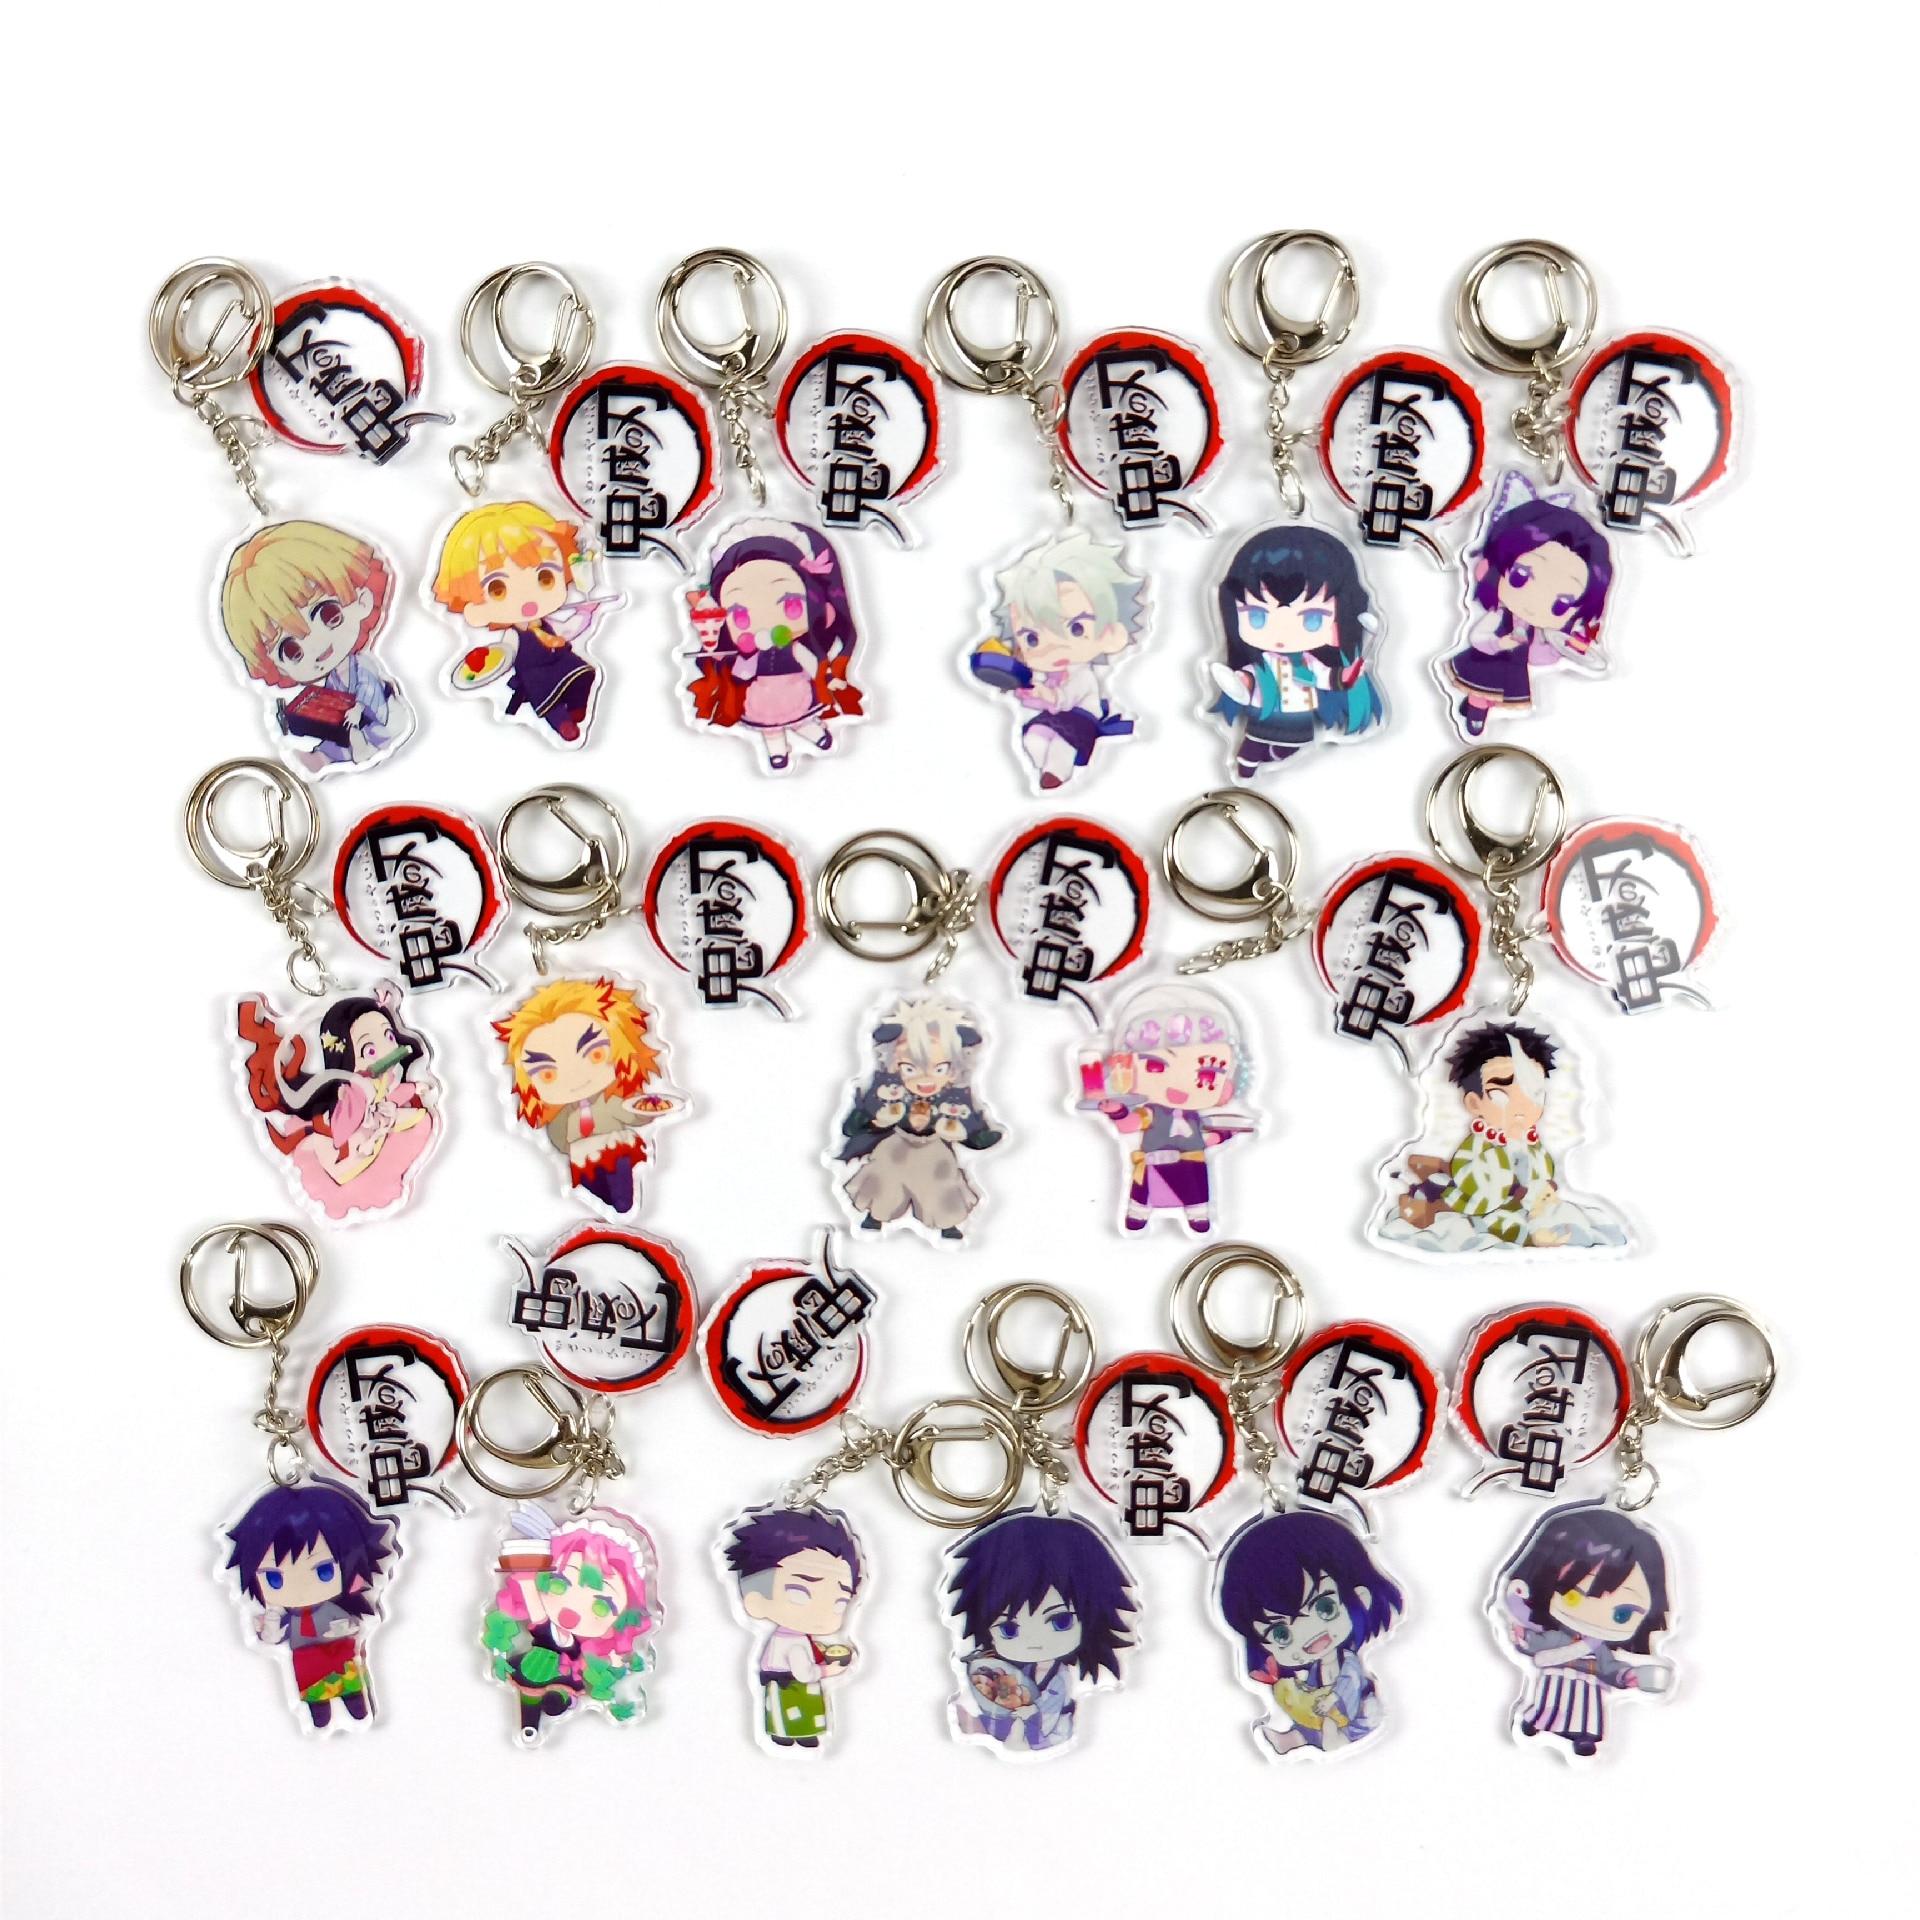 New 18Styles Demon Slayer Kimetsu No Yaiba Kamado Nezuko Zenitsu Giyuu Sanemi Keychain Blade Of Ghost Keyring Acrylic Key Chains